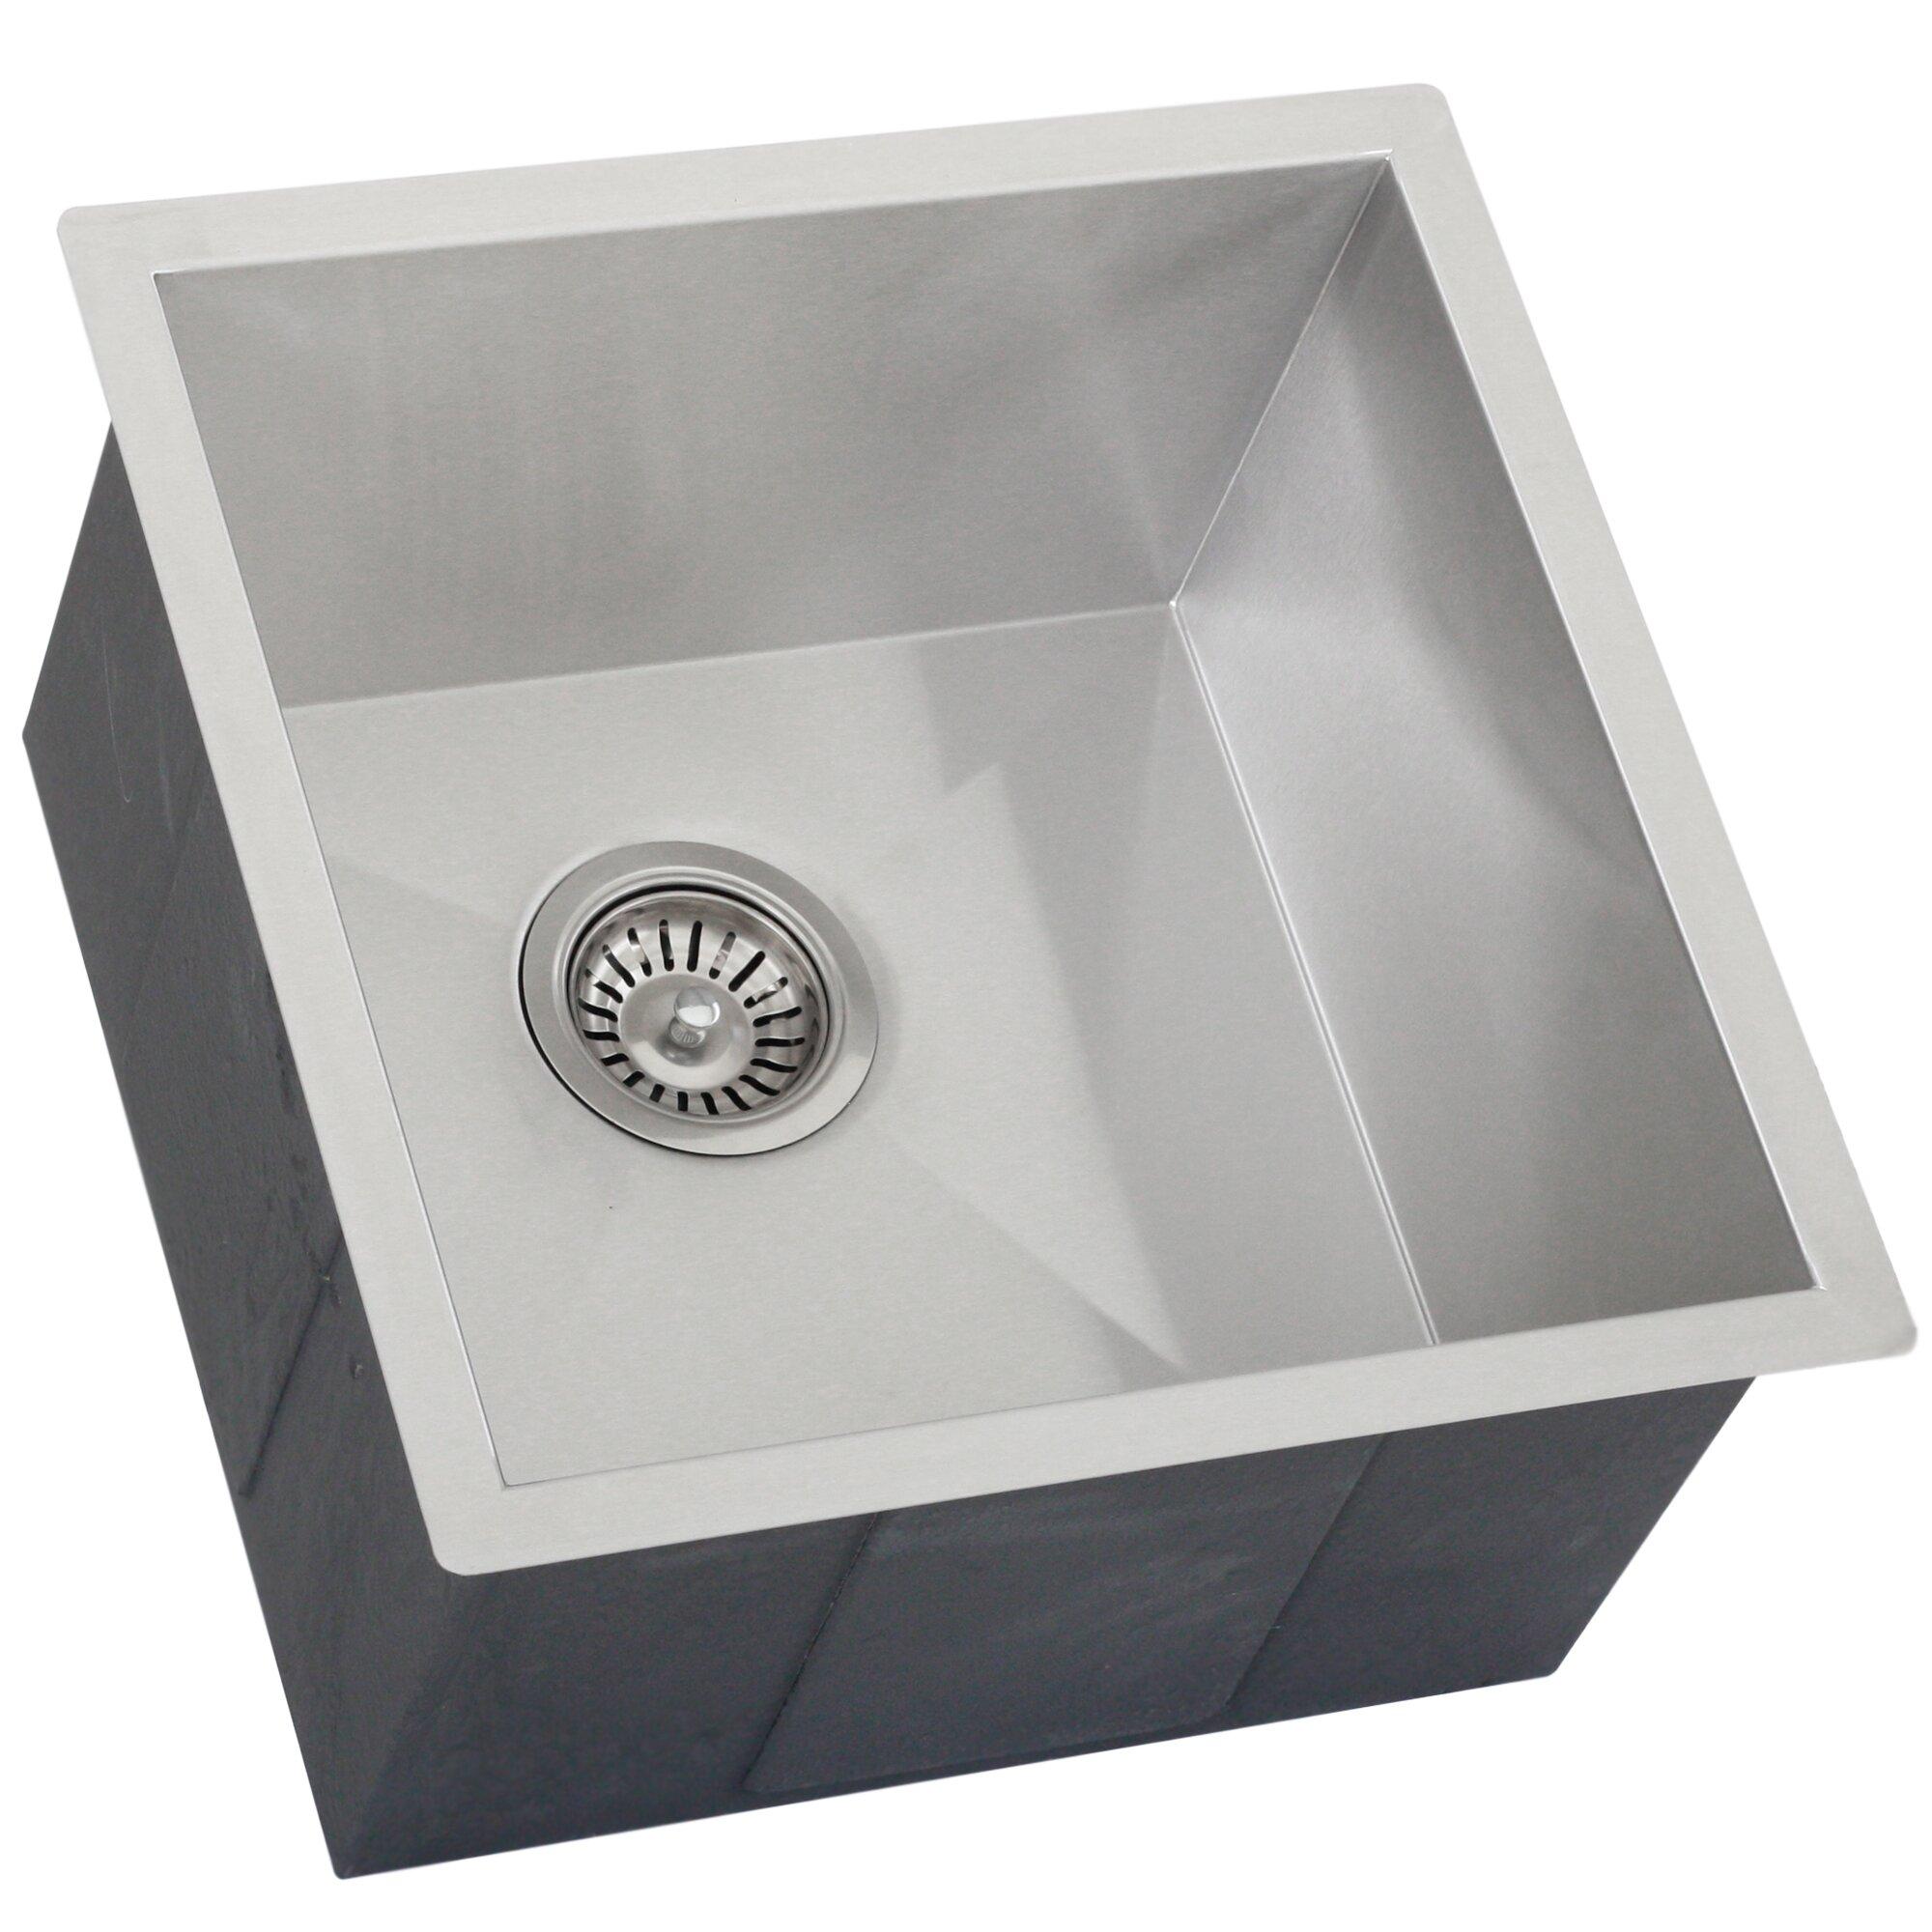 Ticor Sinks : ... Steel Single Bowl Square Undermount Kitchen Bar Sink by Ticor Sinks